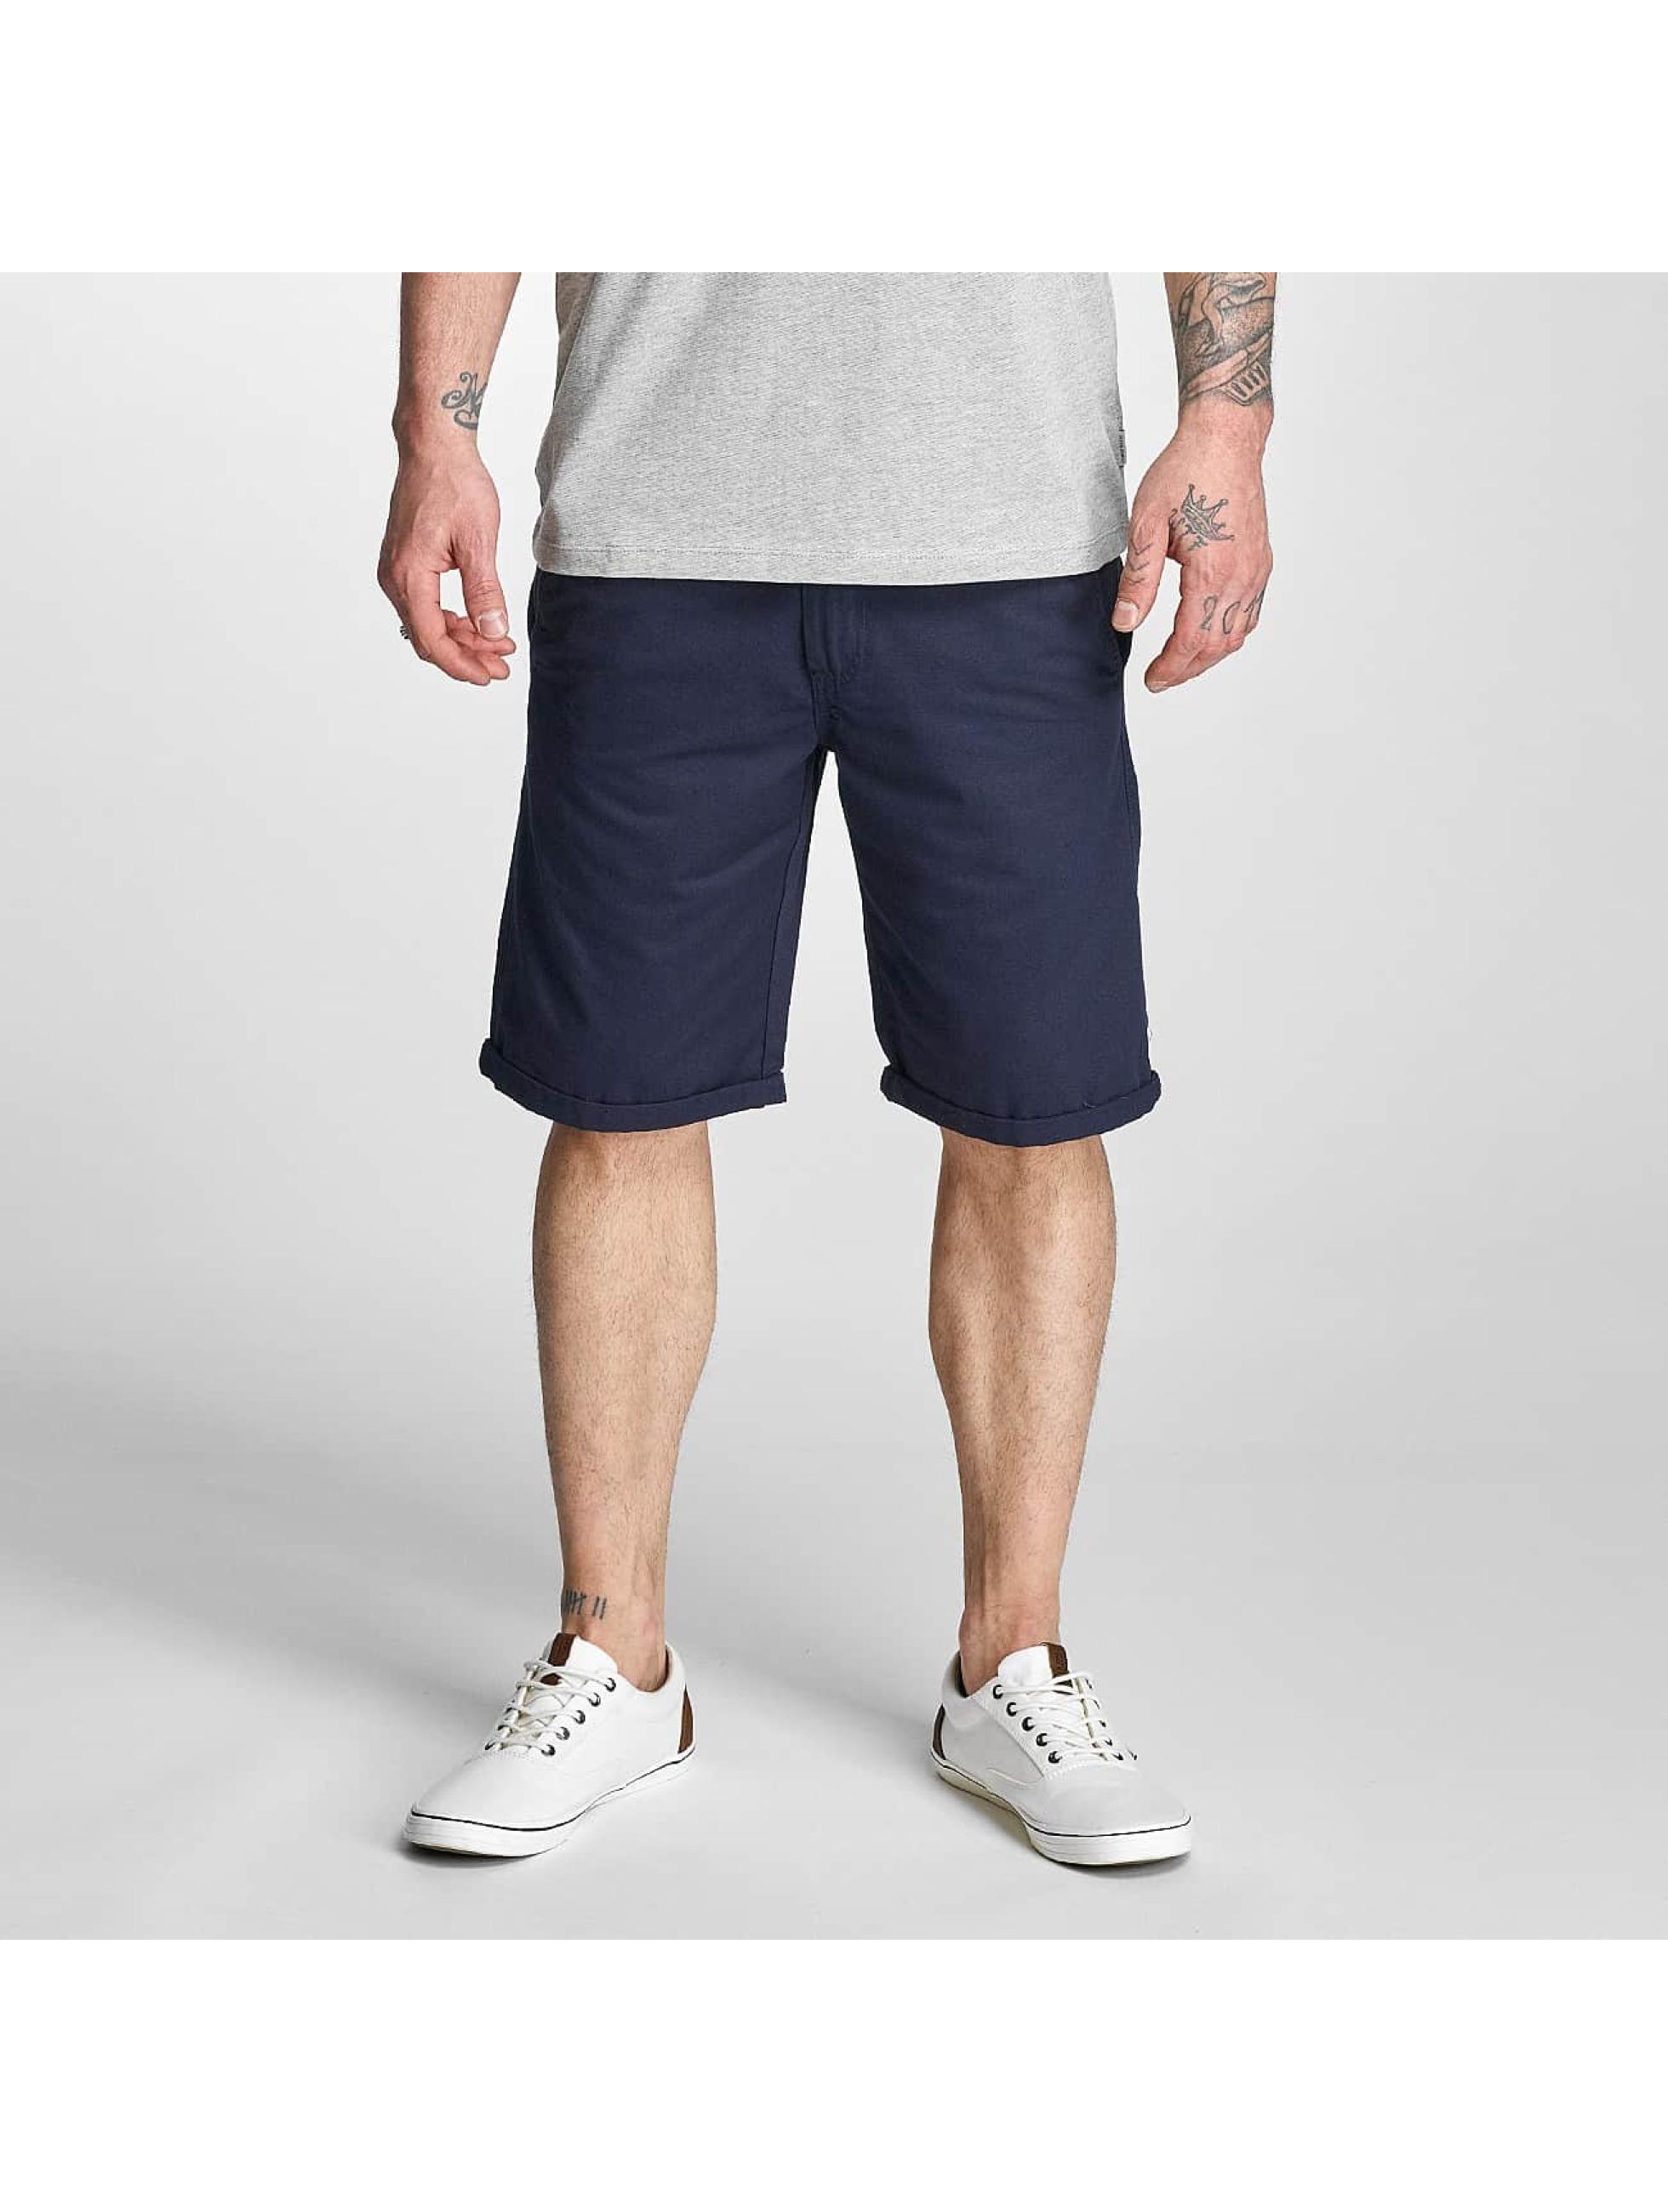 Solid Pantalon / Shorts Gabi en bleu